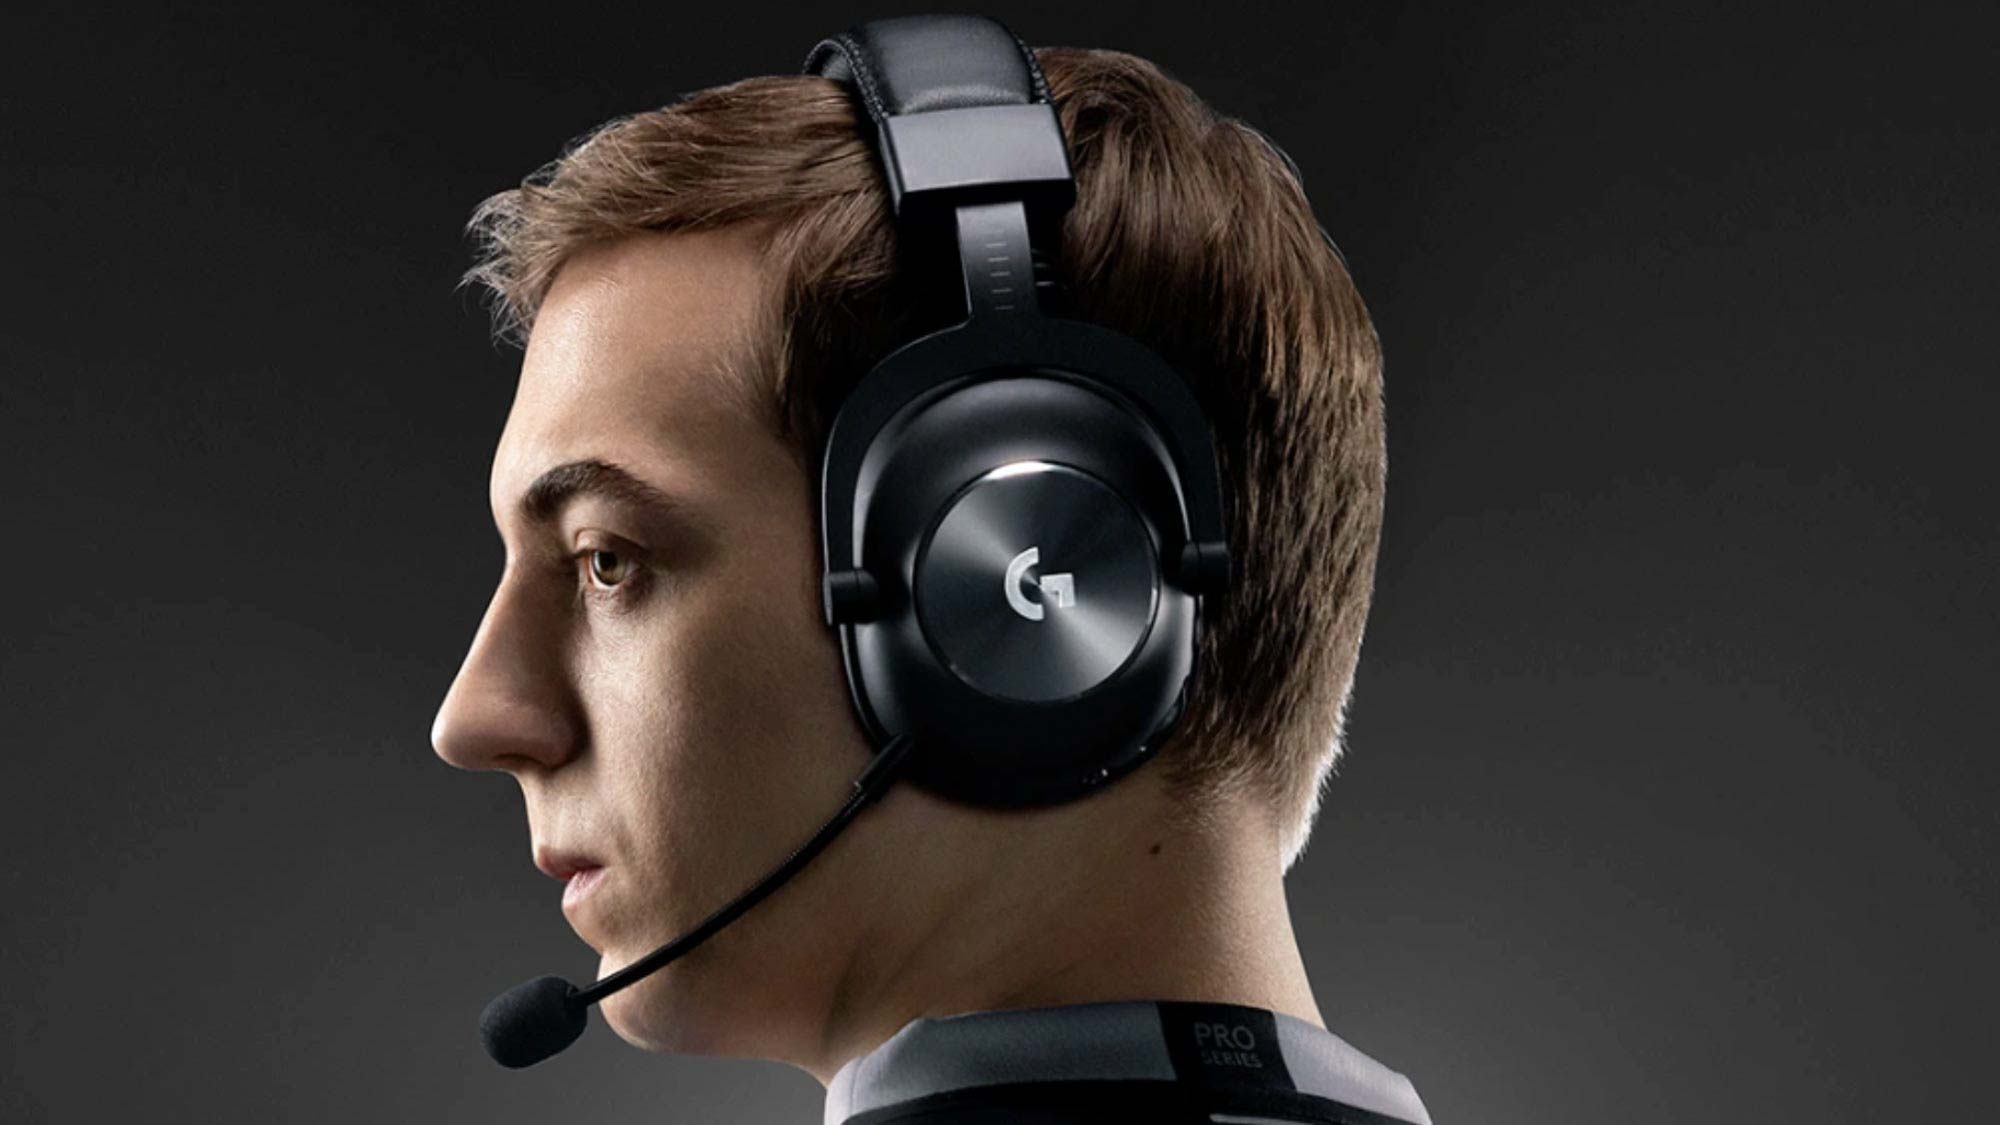 Best wireless gaming headsets: Logitech G Pro X Wireless